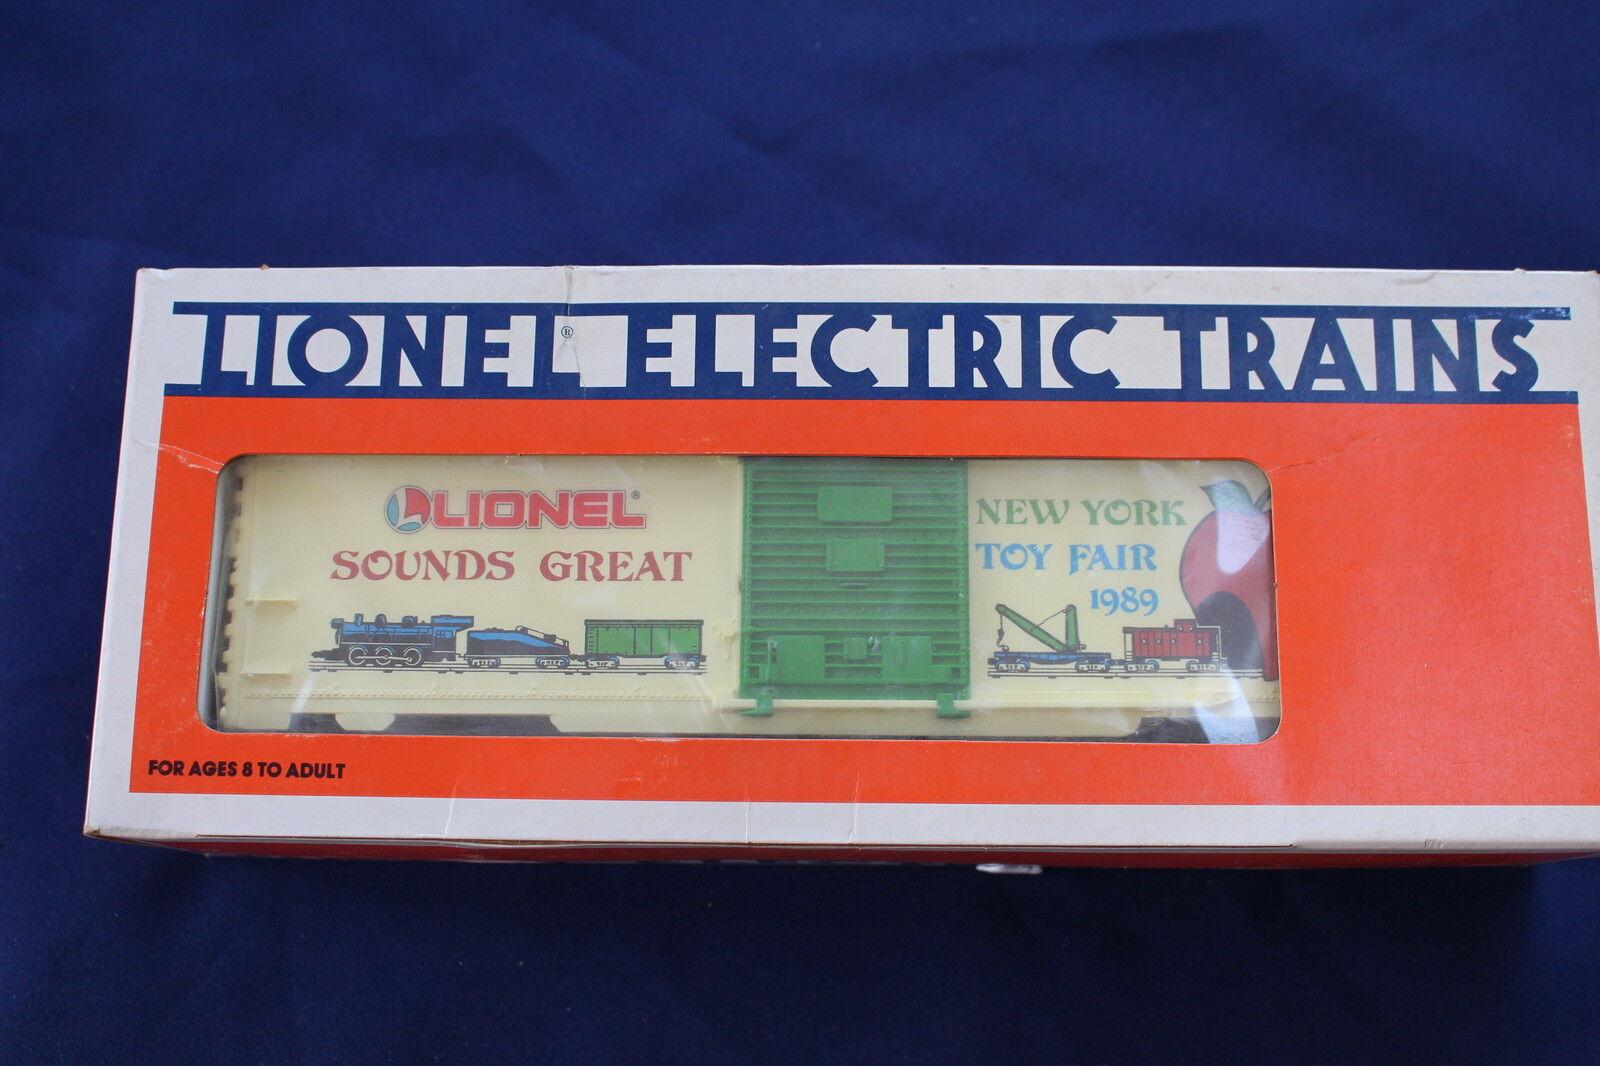 1989 Lionel 6-19907 Nuovo York Toy Fair Box Car L2945